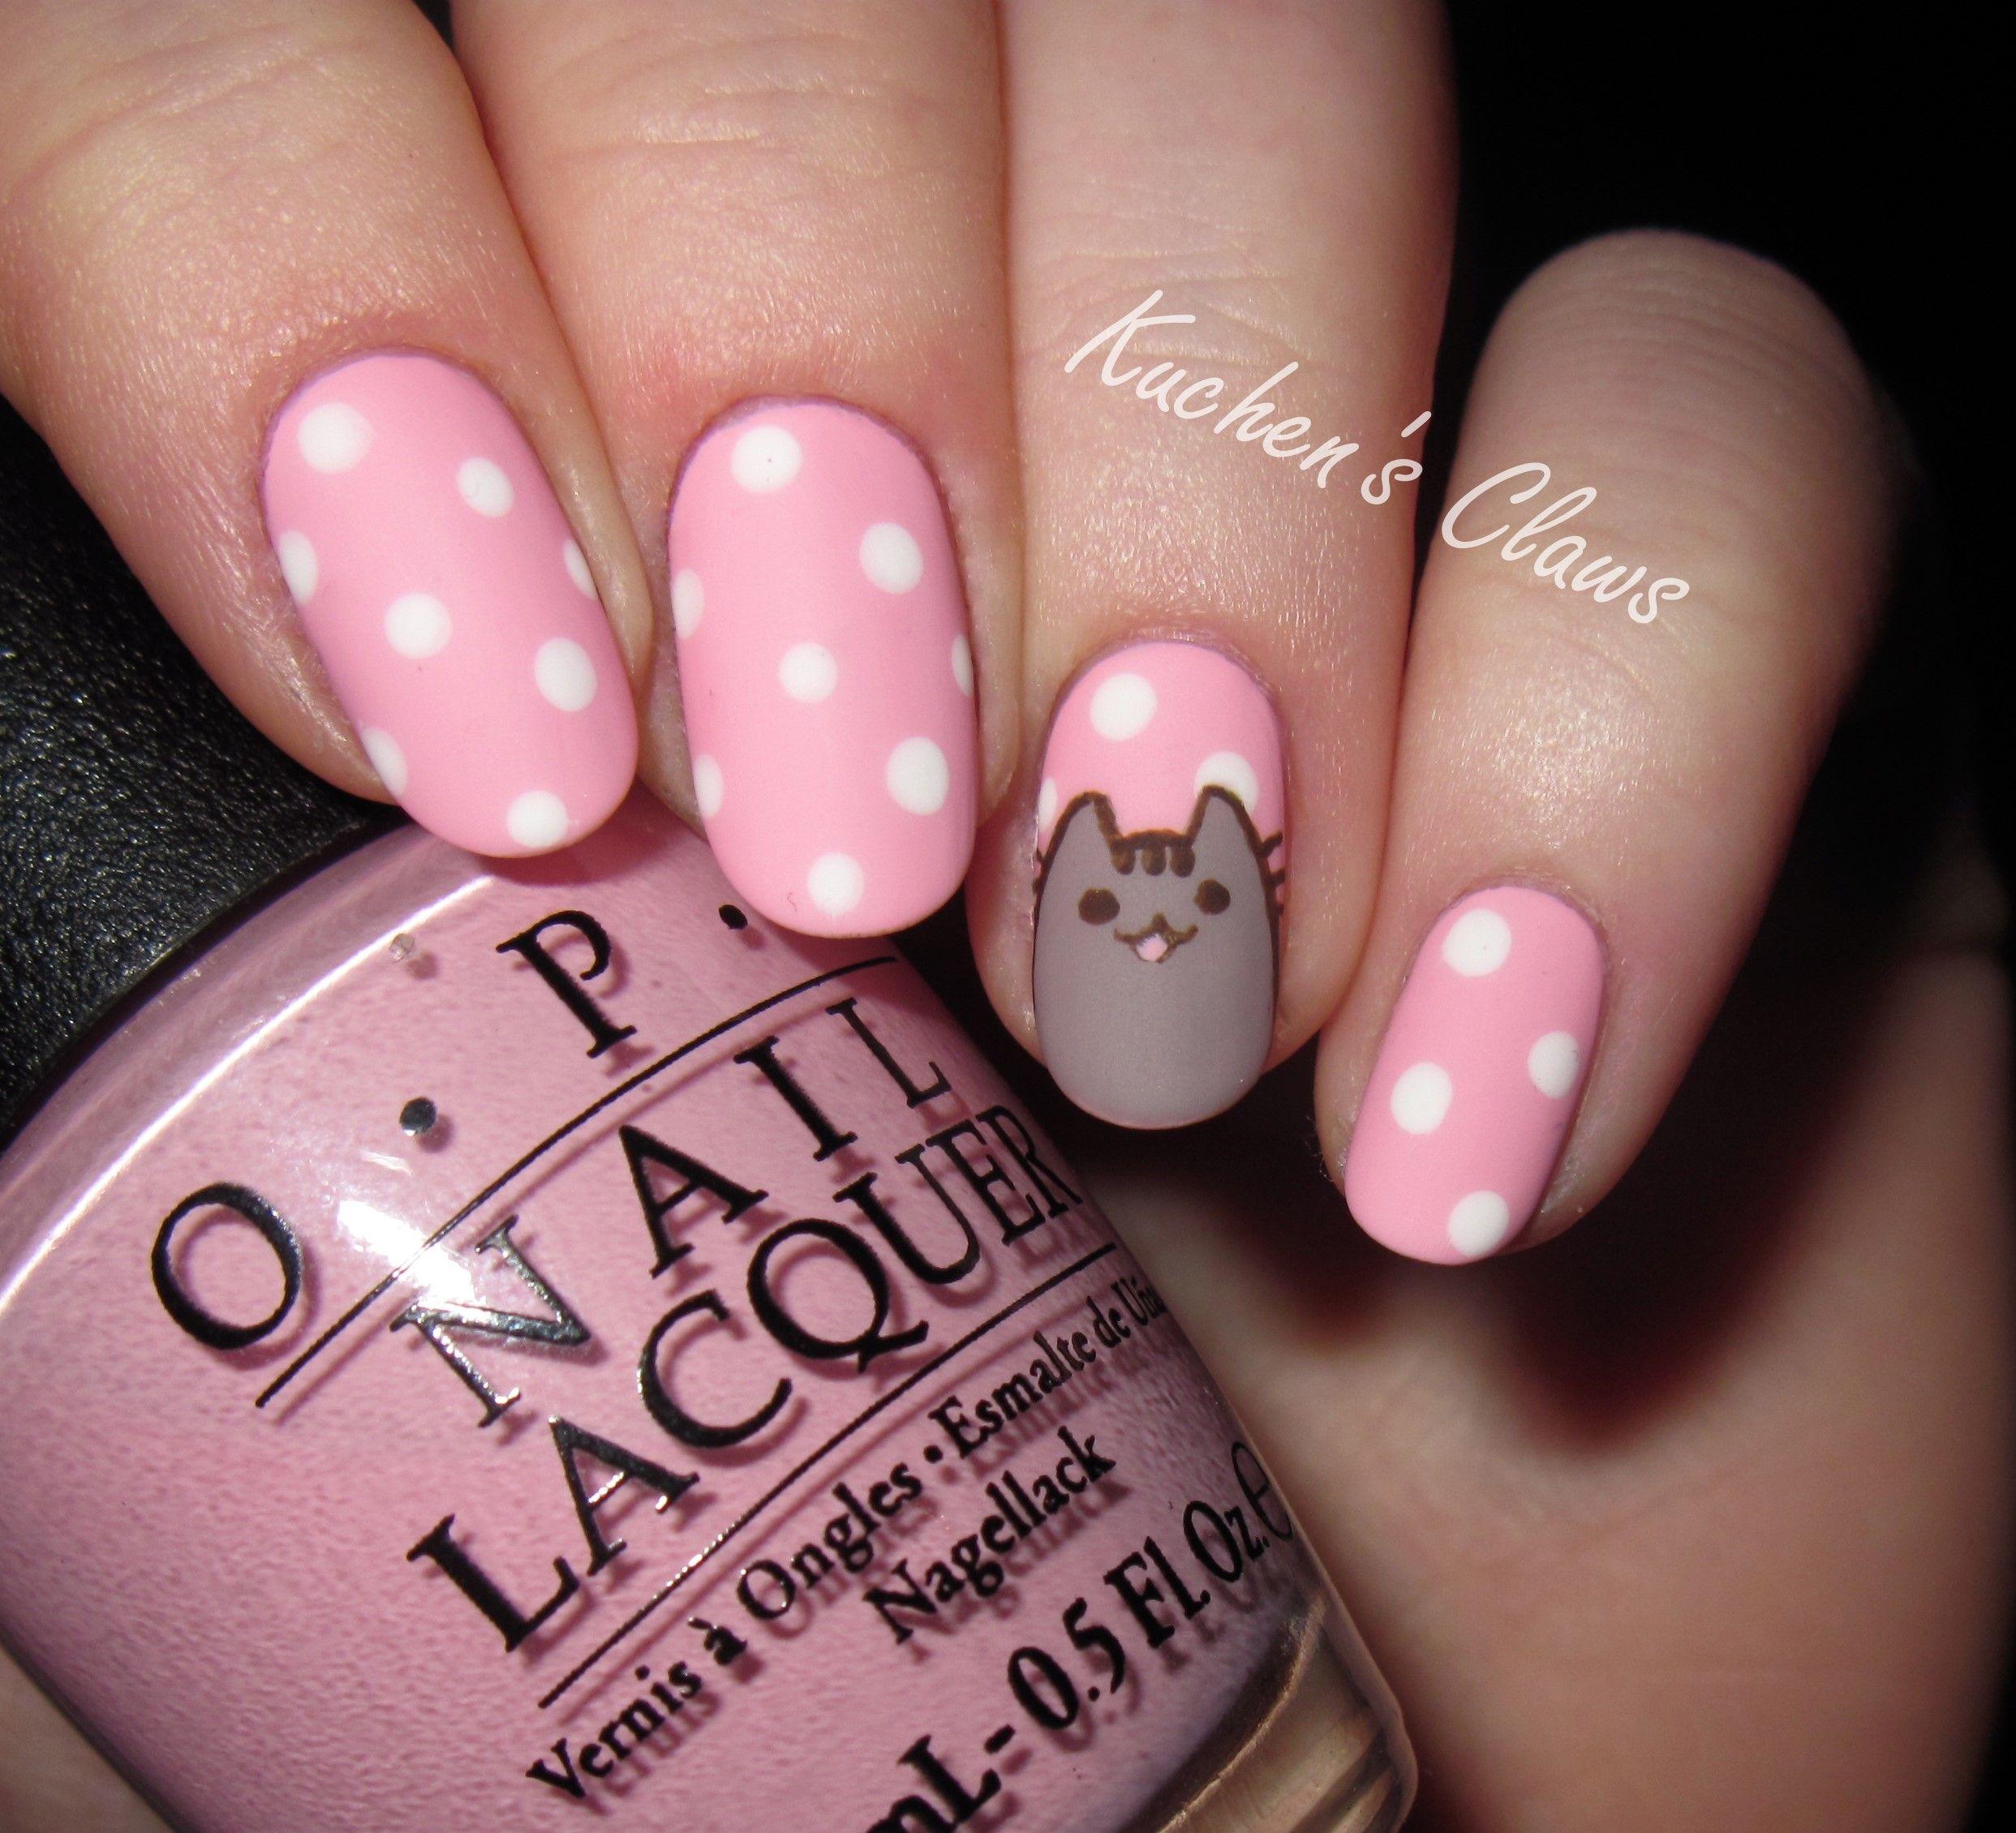 uñas decoradas con gatos 20 diseños con mucha ternura | Holiday nail ...